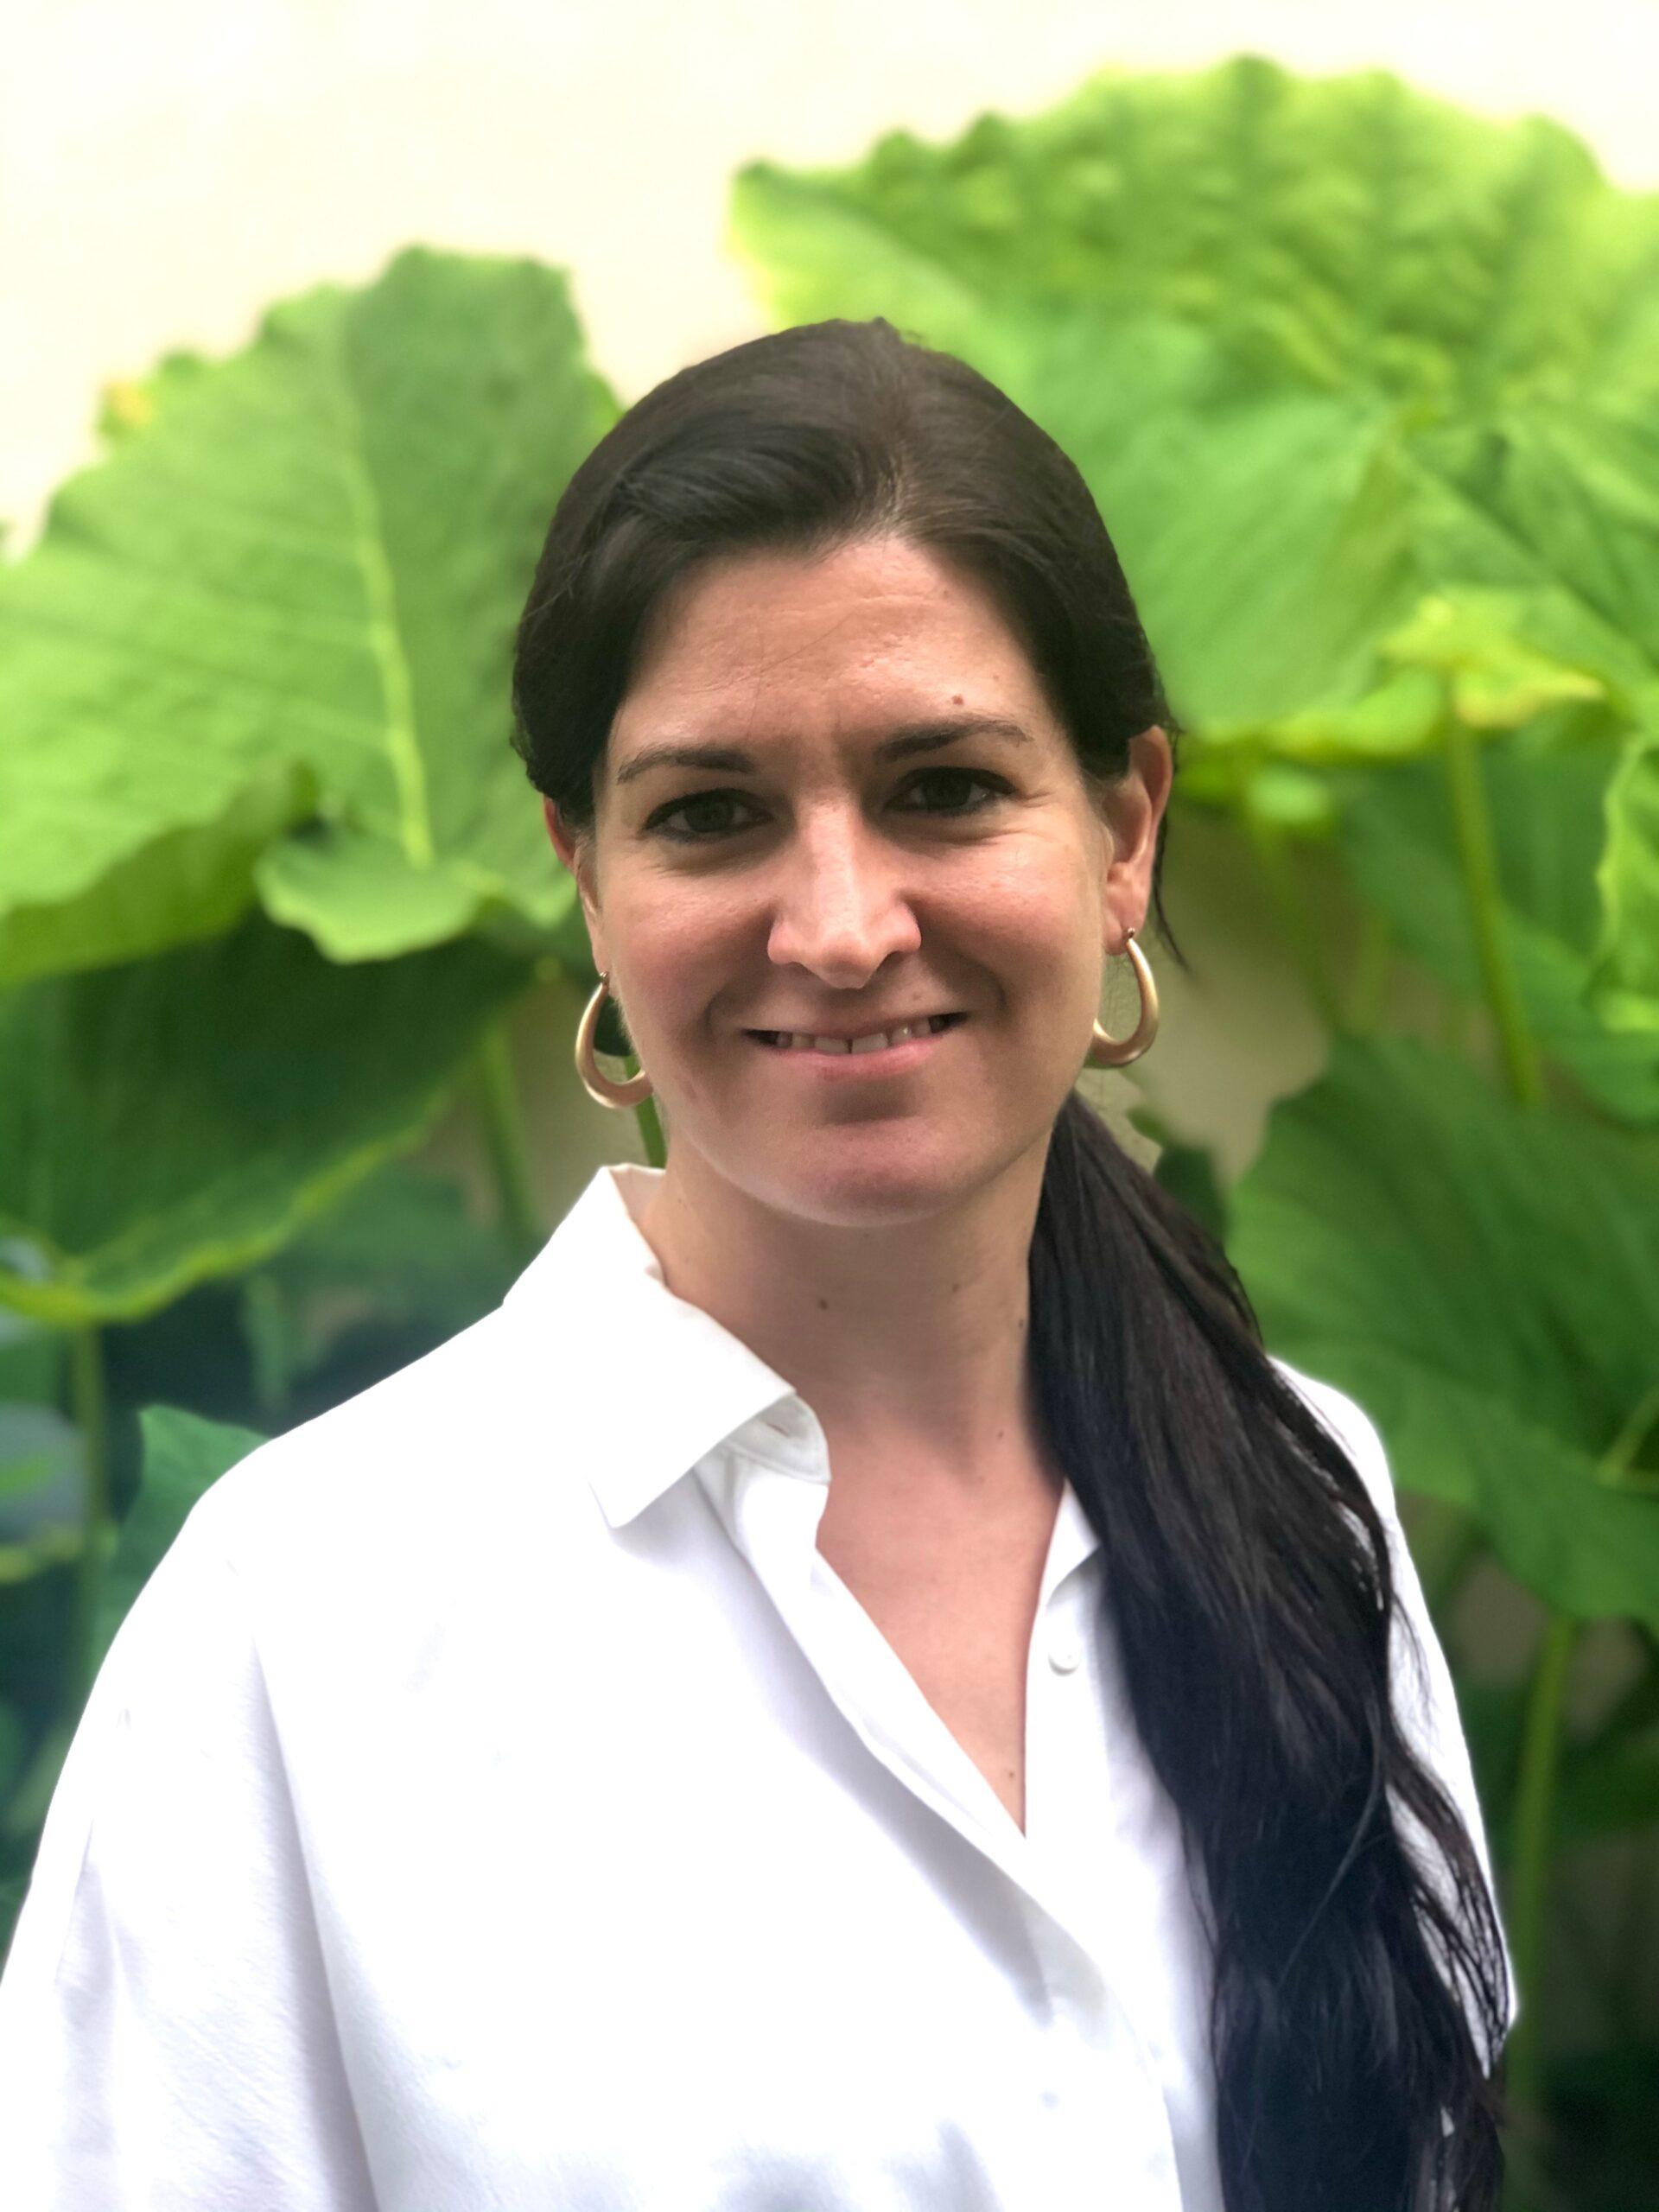 Crystal M. Slanzi, PhD